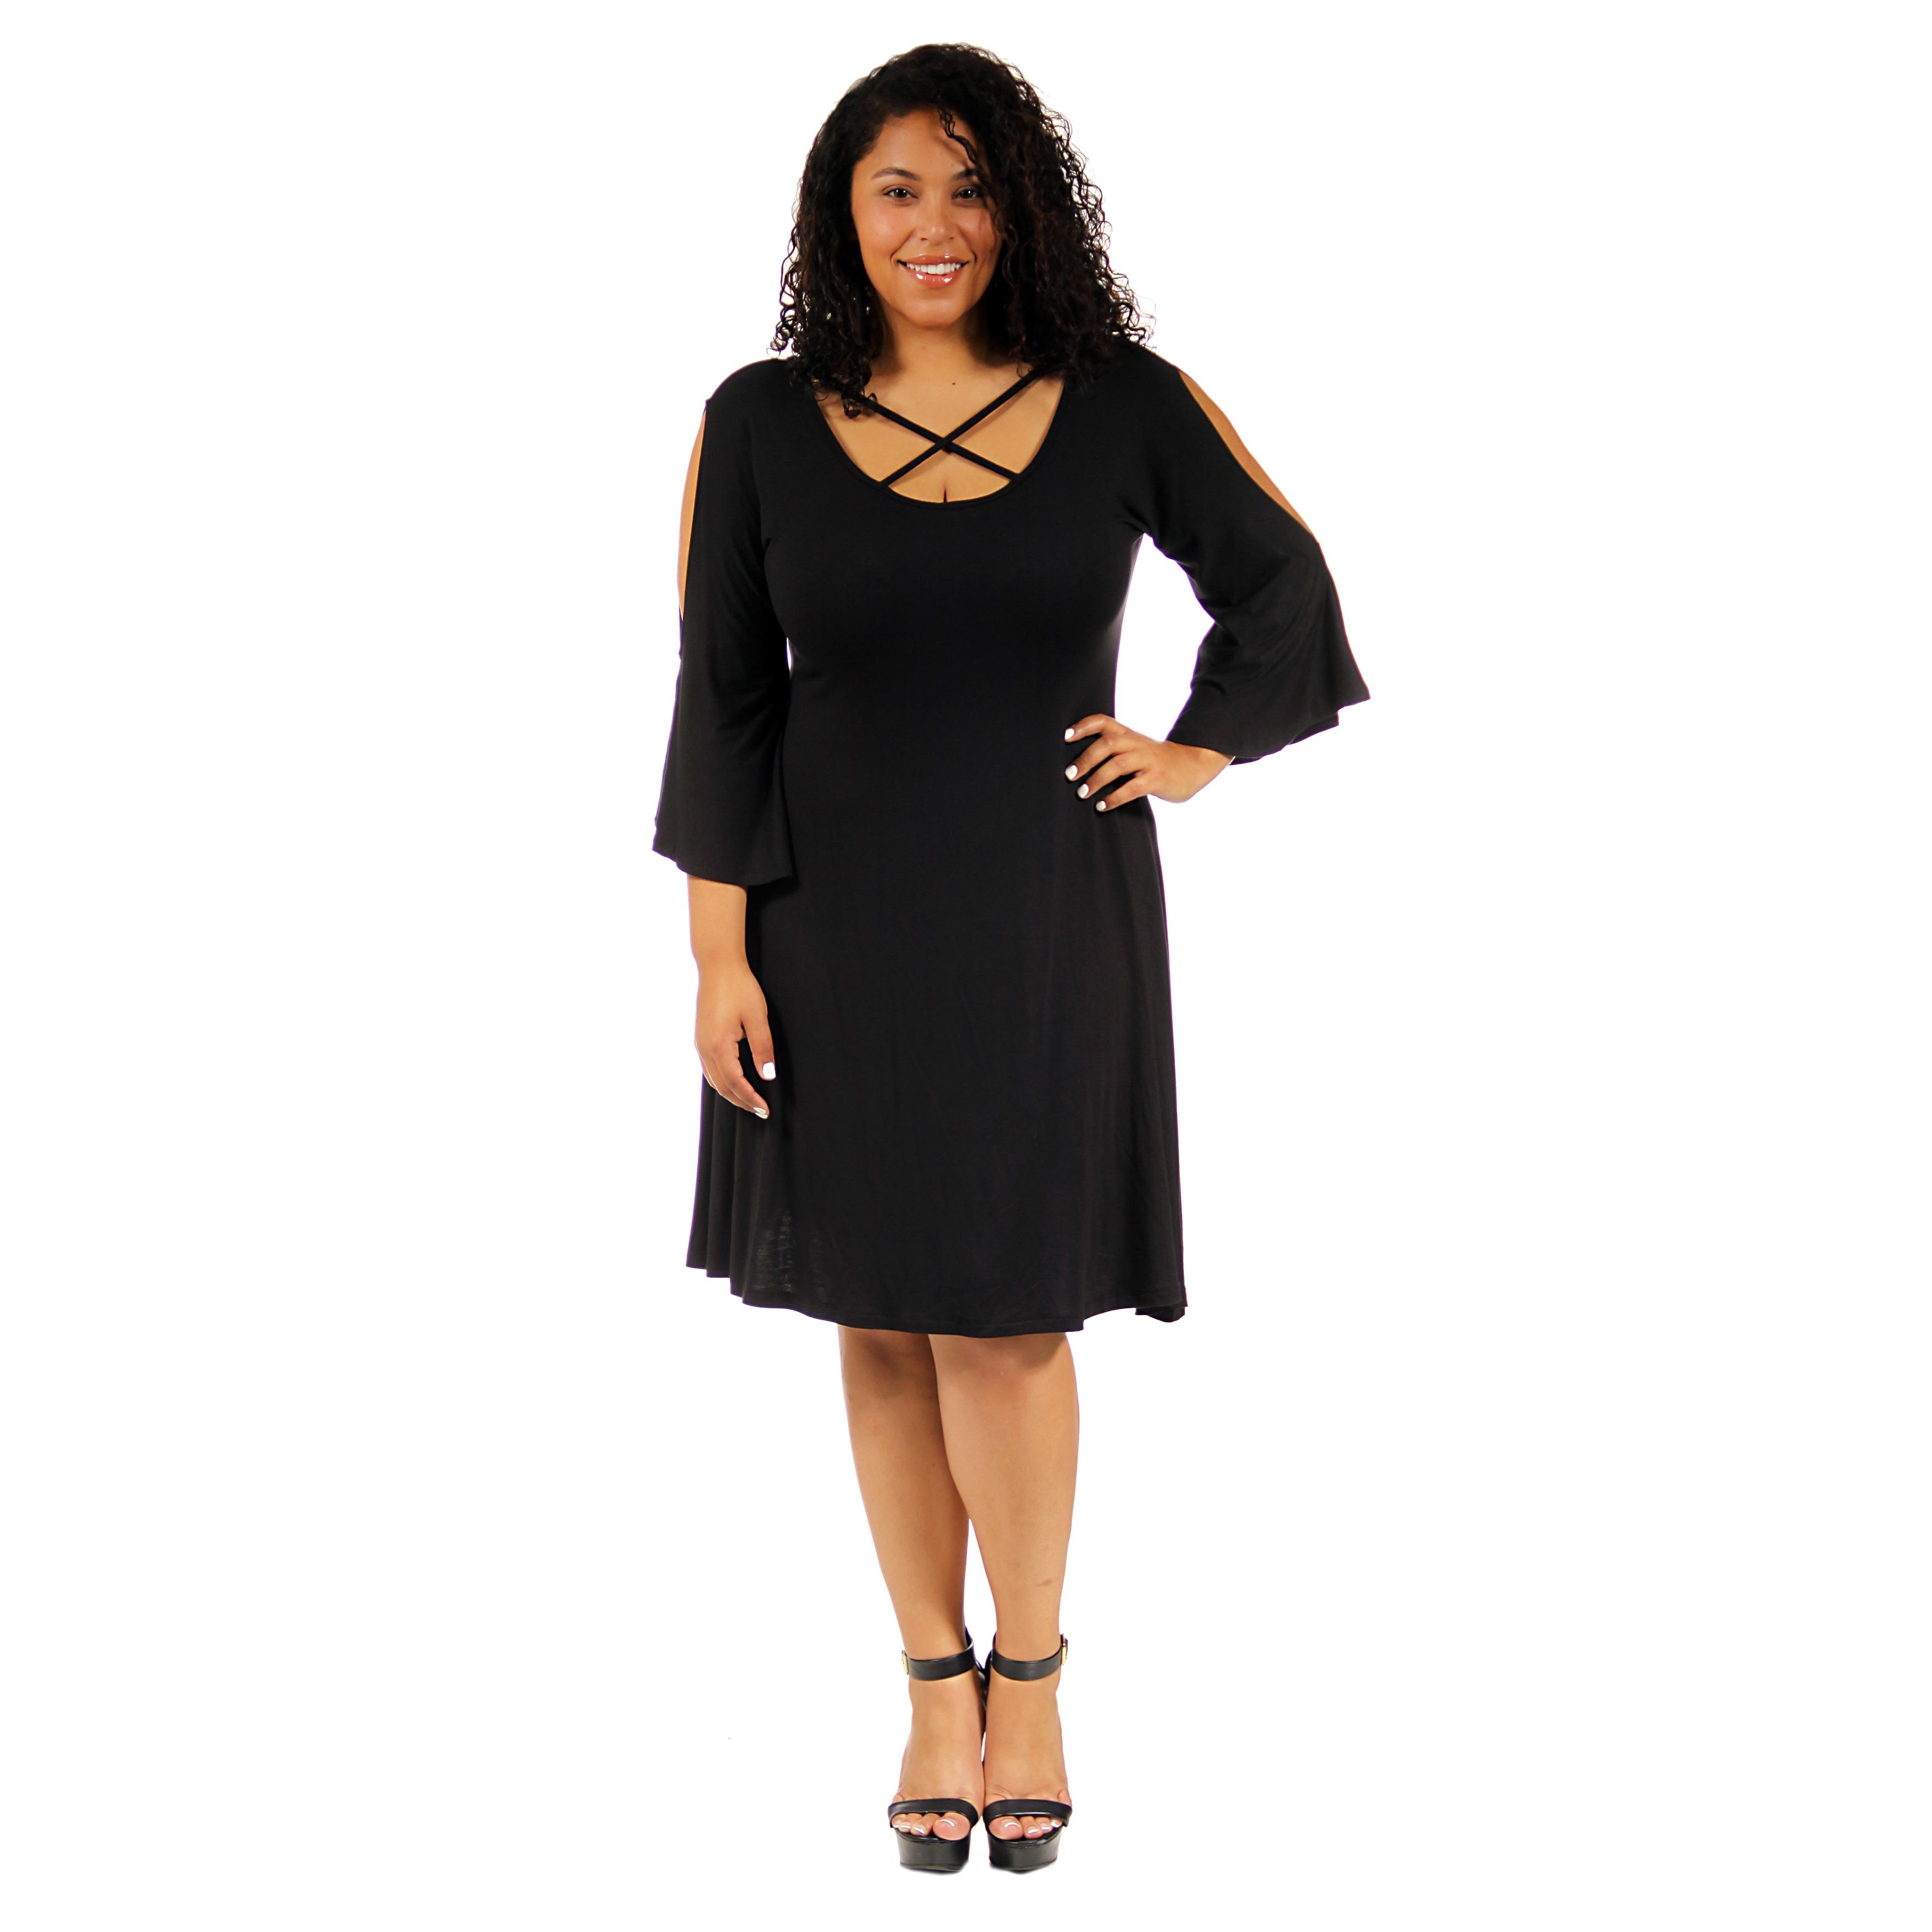 b4b7dd2ef59 24 7 Comfort Apparel Women s Plus-size Abstract Neck Split-Sleeve Dress